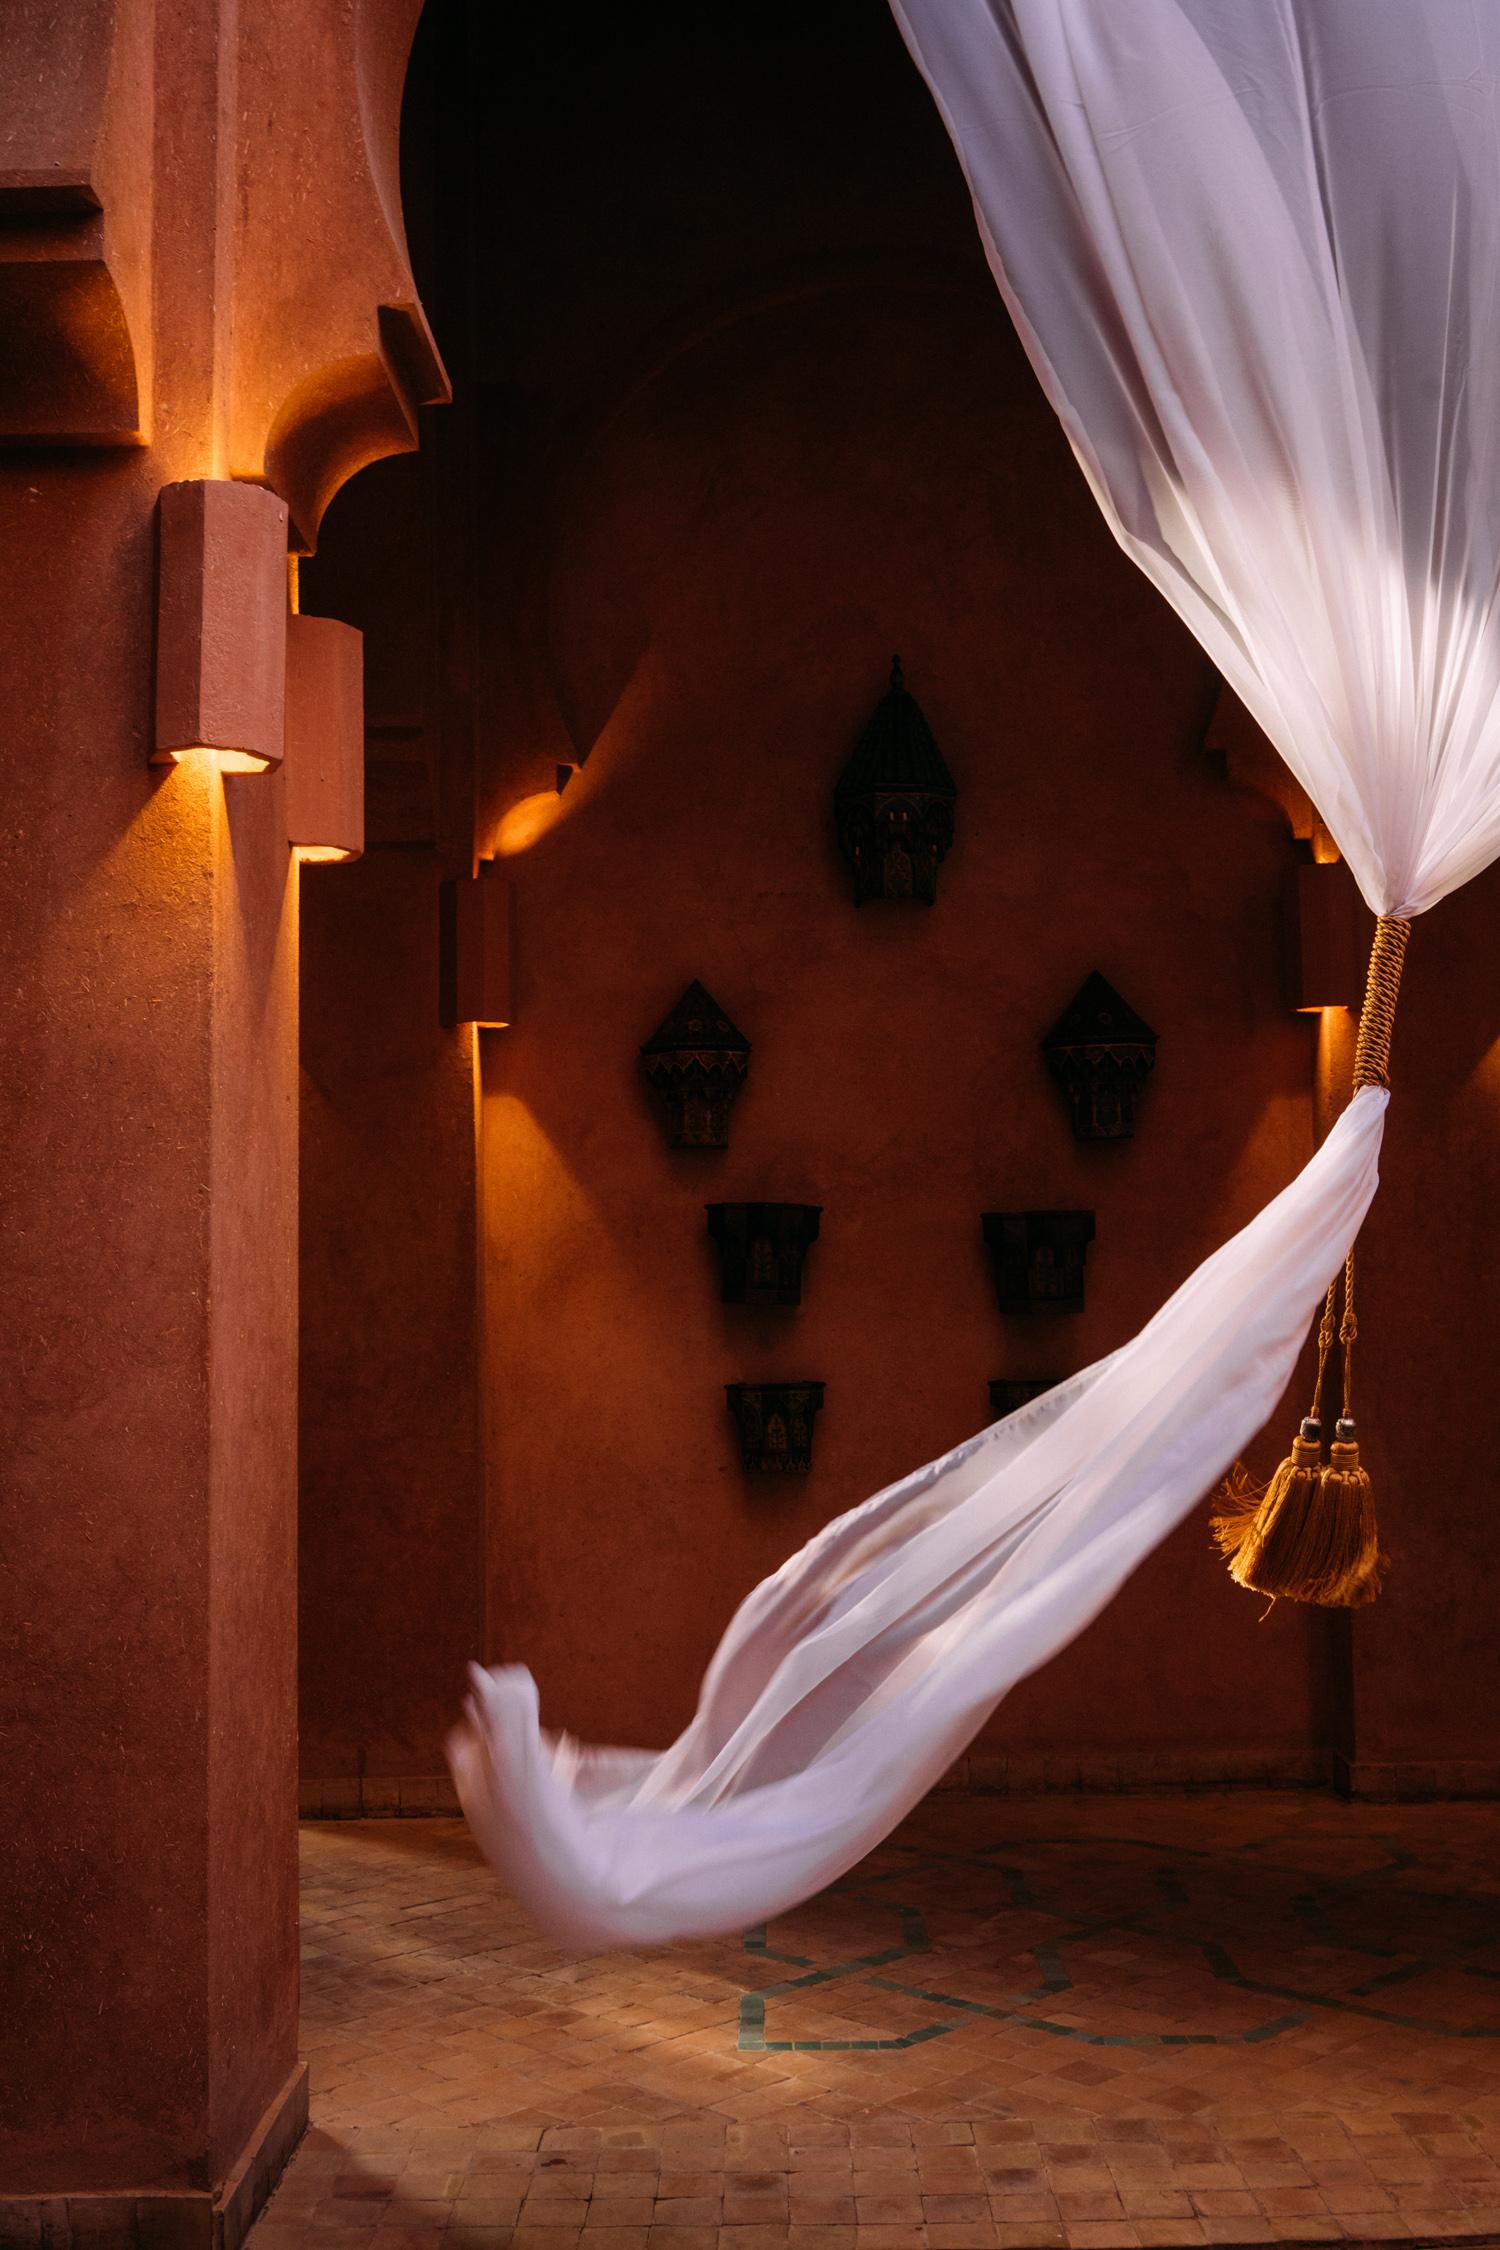 morocco_aman_kateheadley_travel